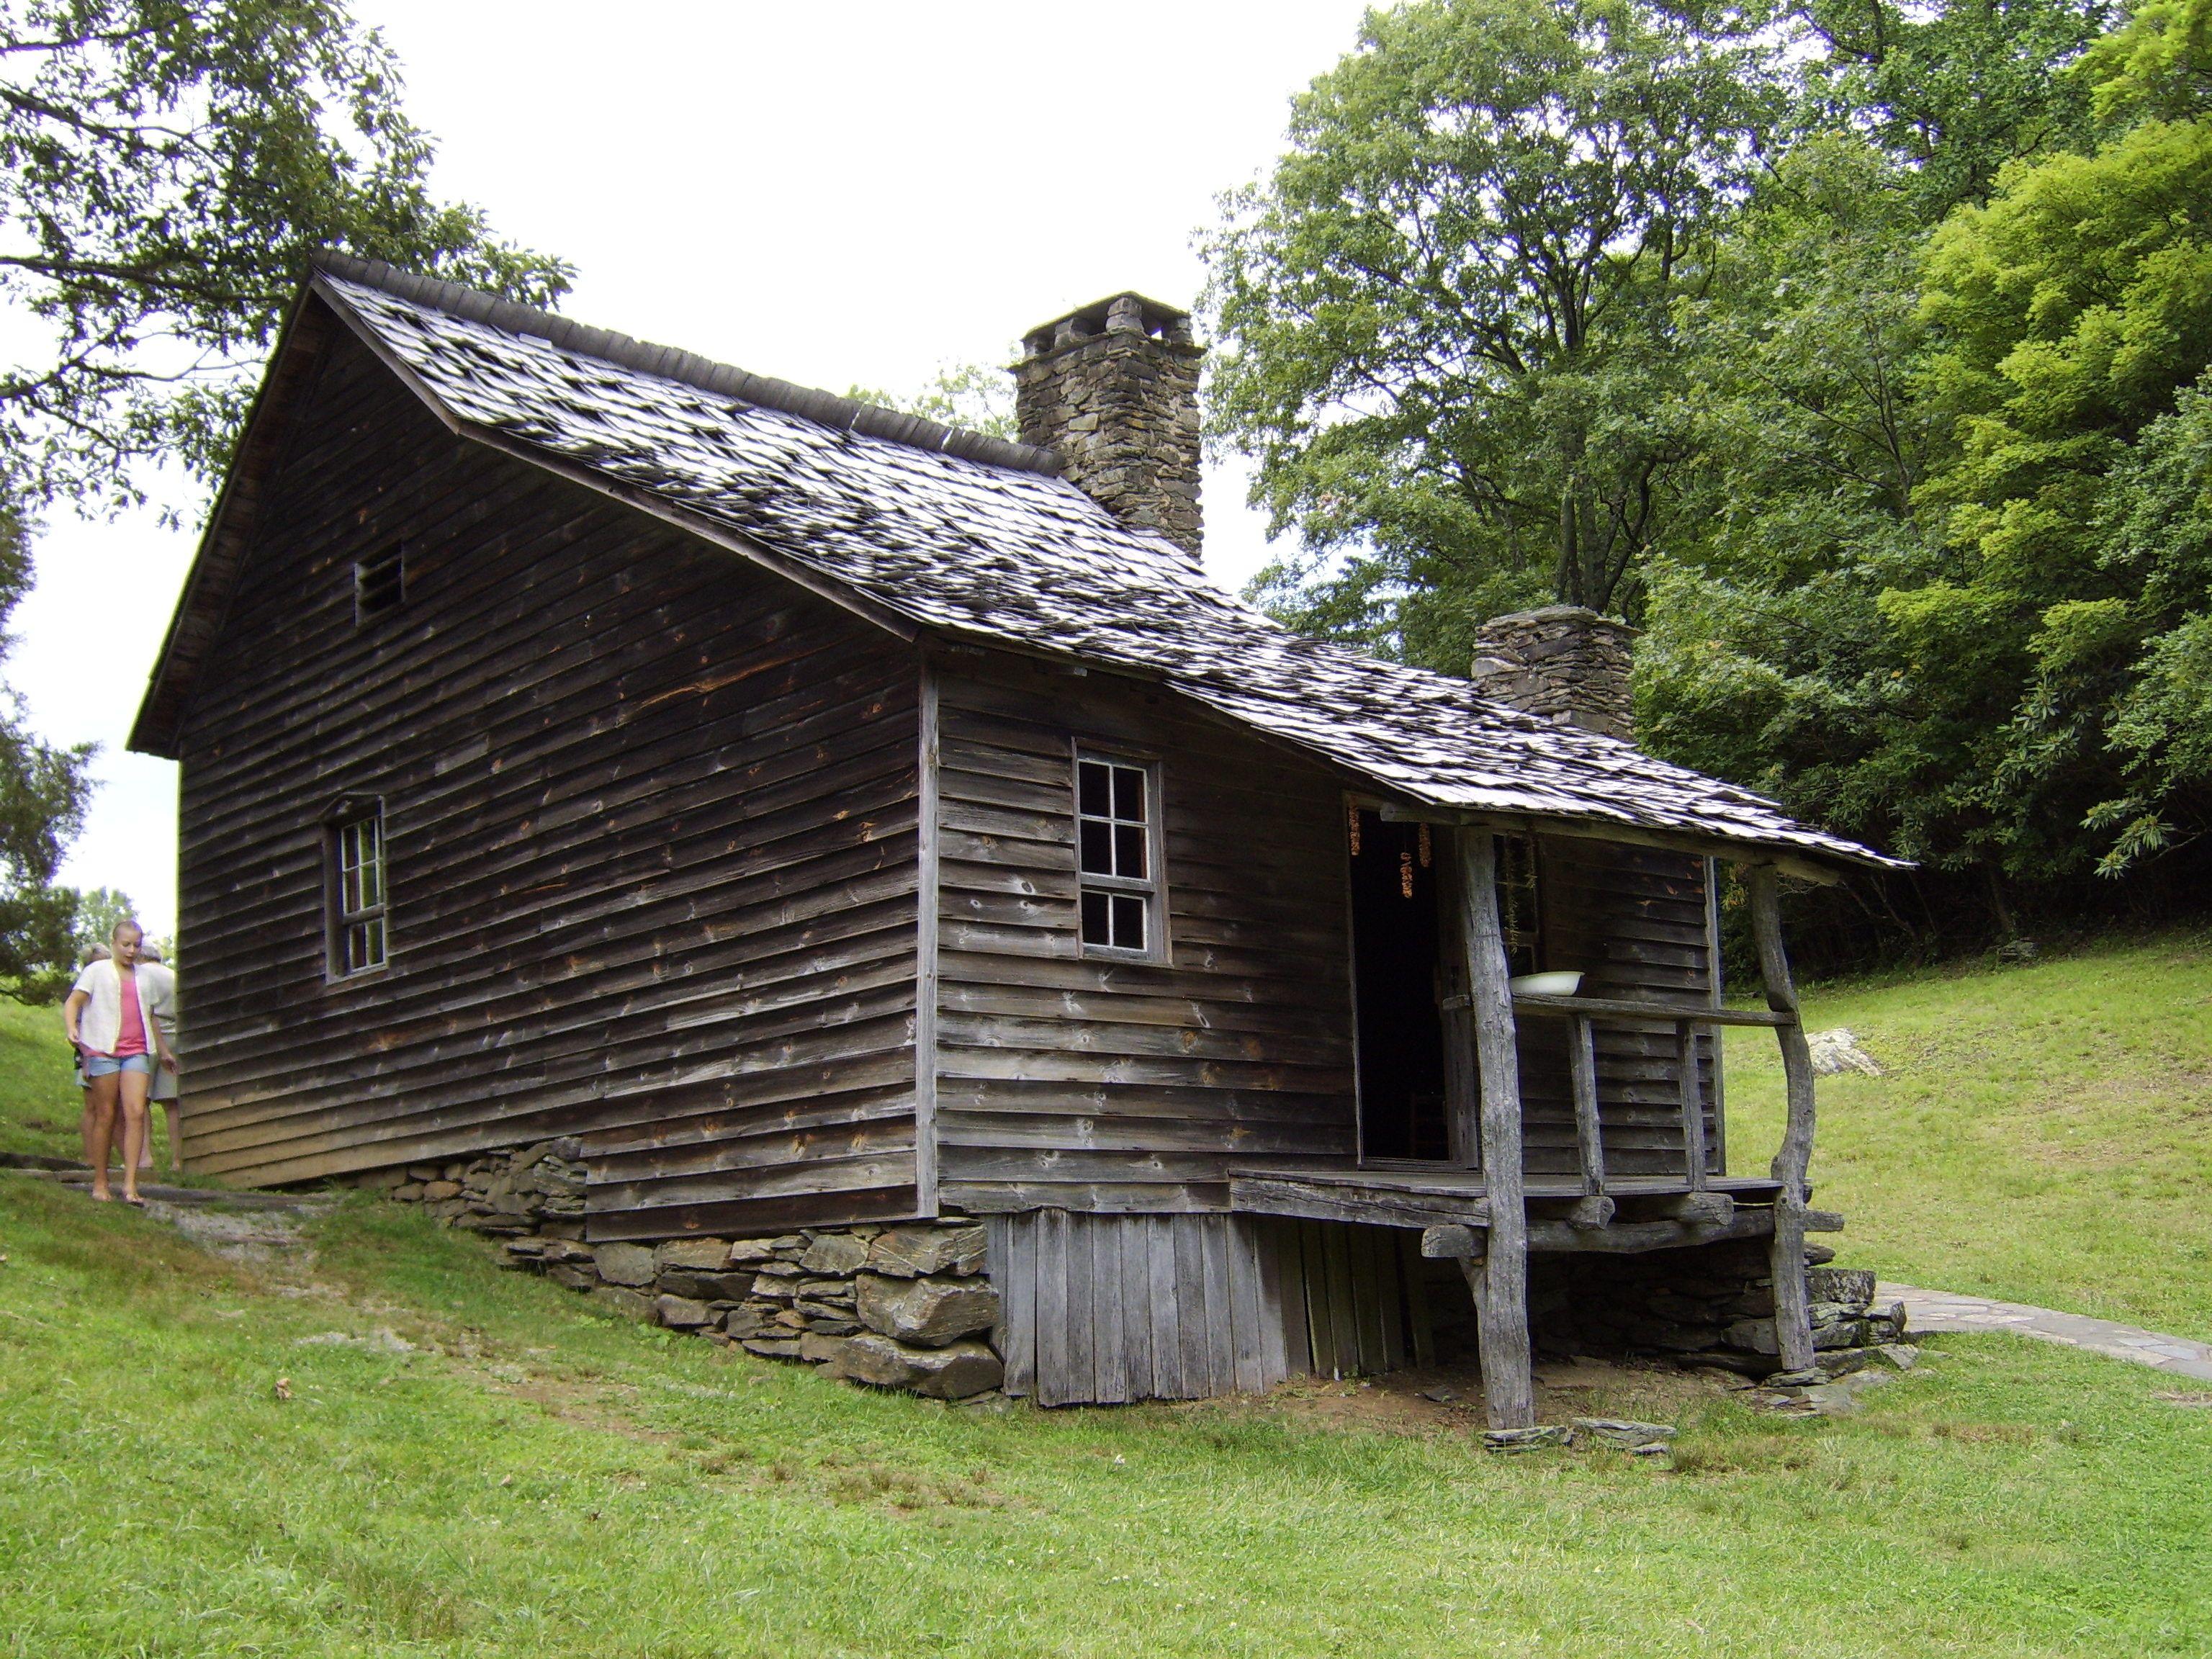 Brinegar Cabin In Alleghany County North Carolina